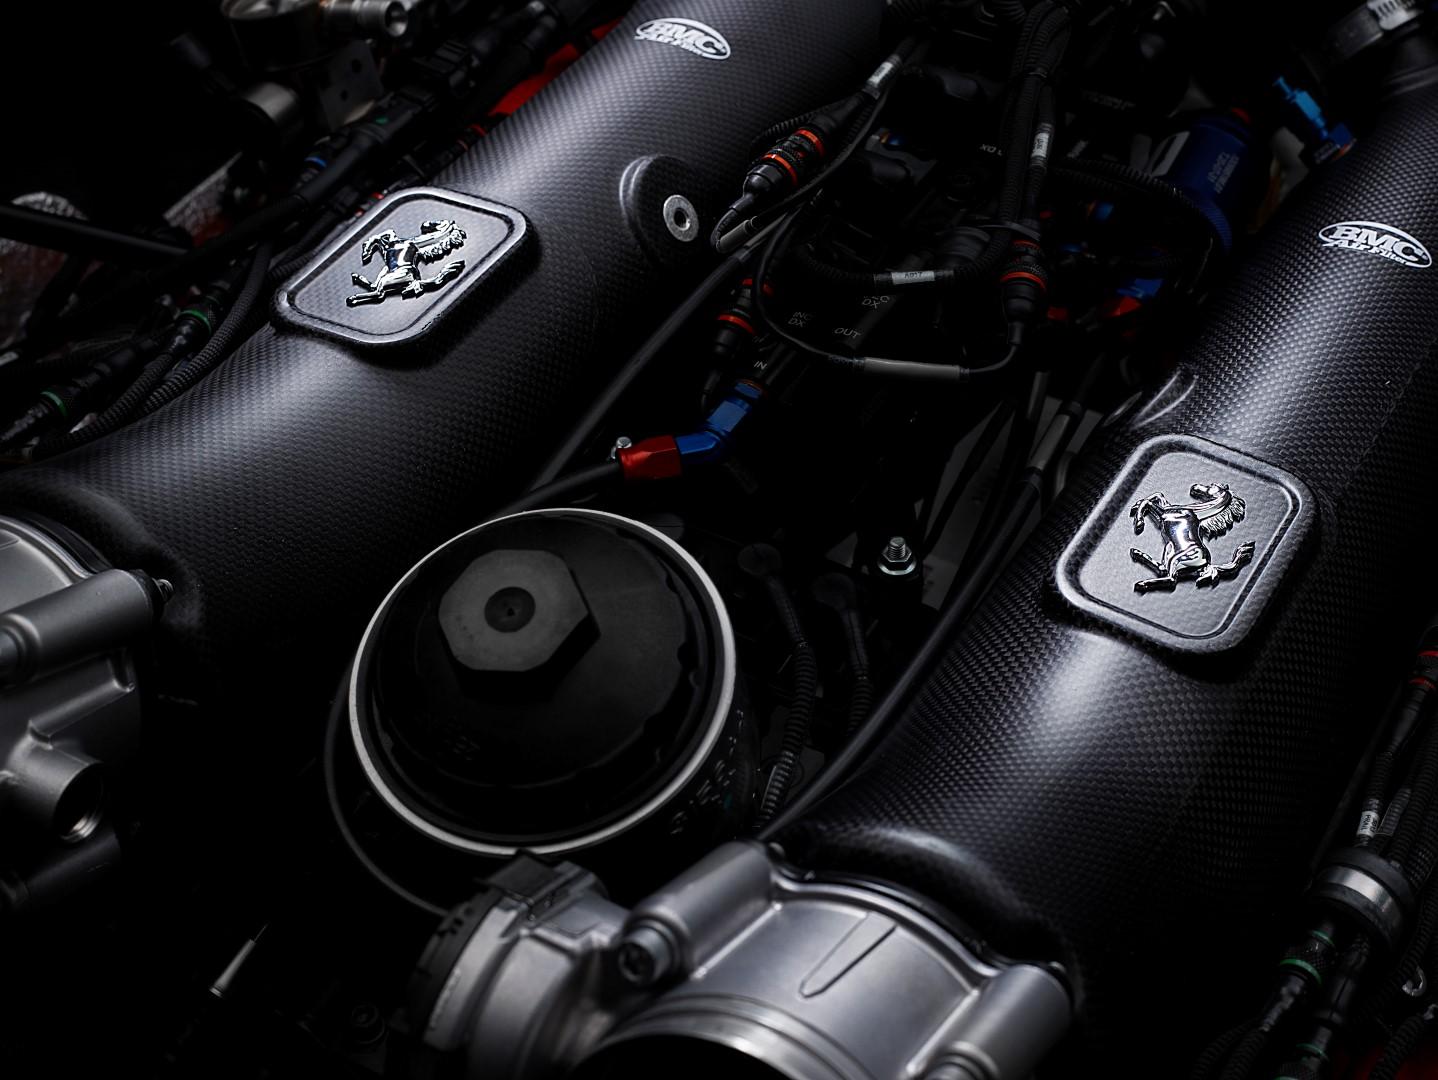 Ferrari 488 GT Modificata engine close up